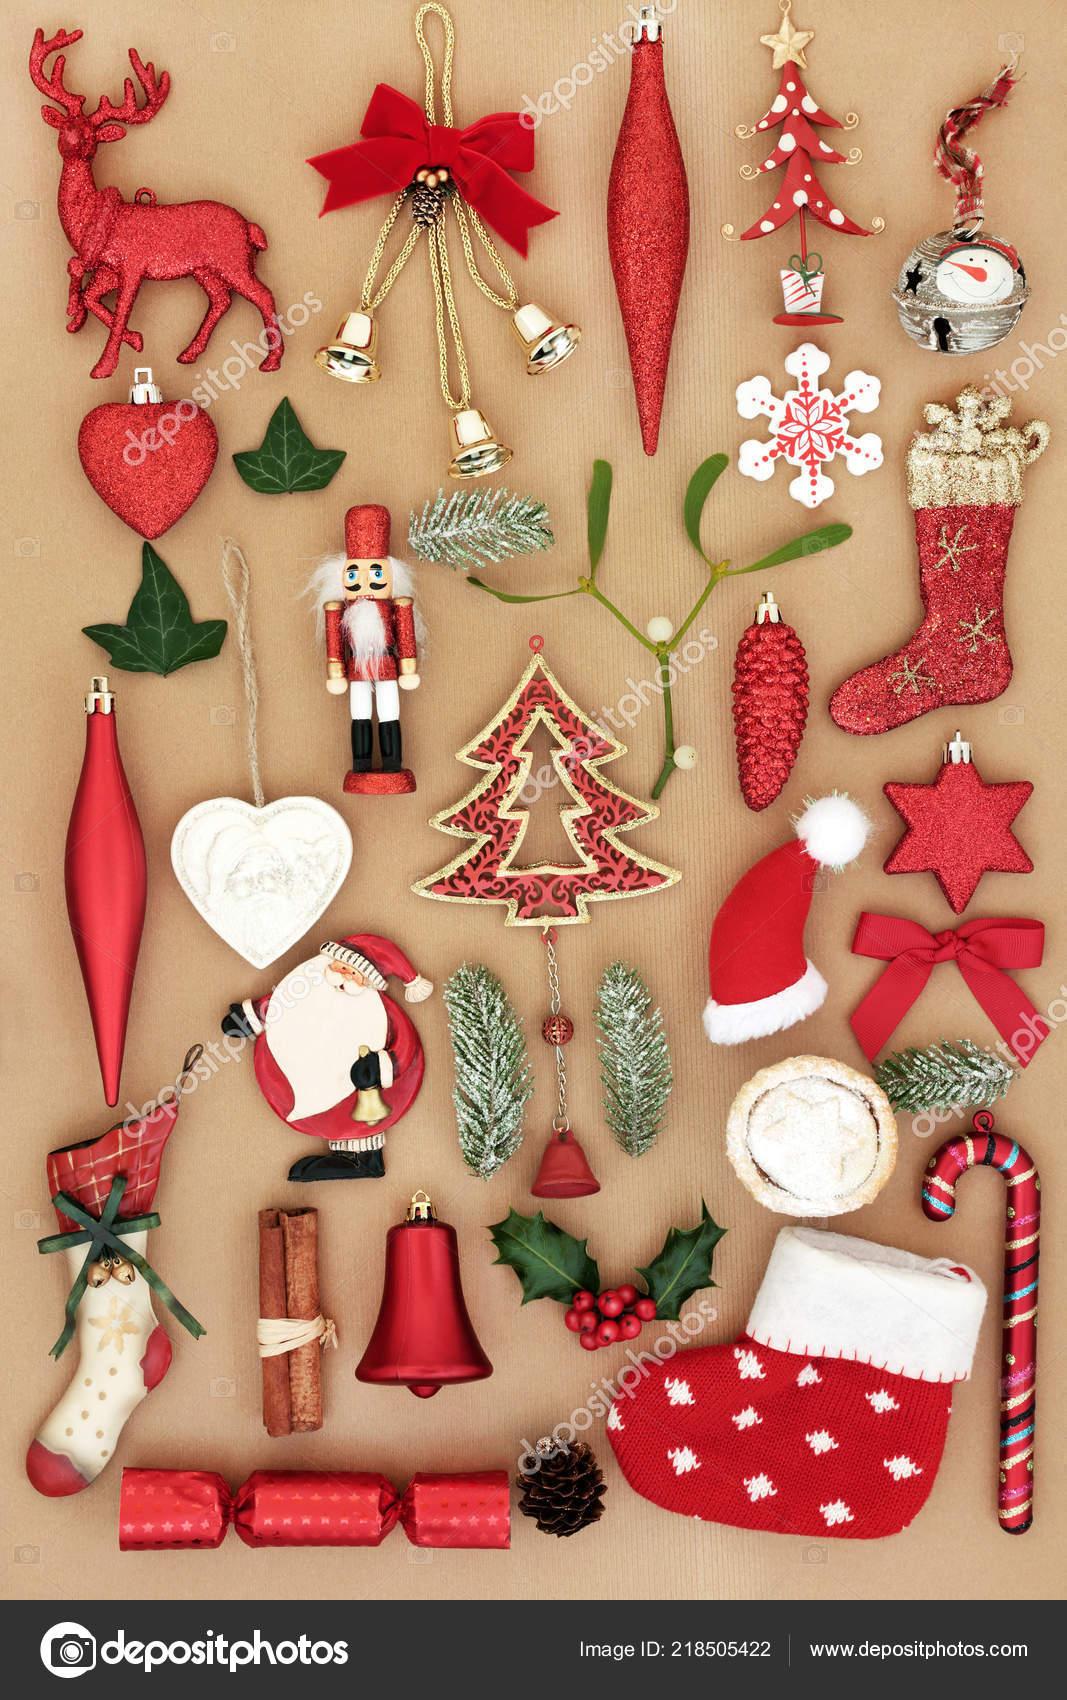 Retro Christbaumschmuck Ornamente Und Symbole Mit Holly Efeu Tanne